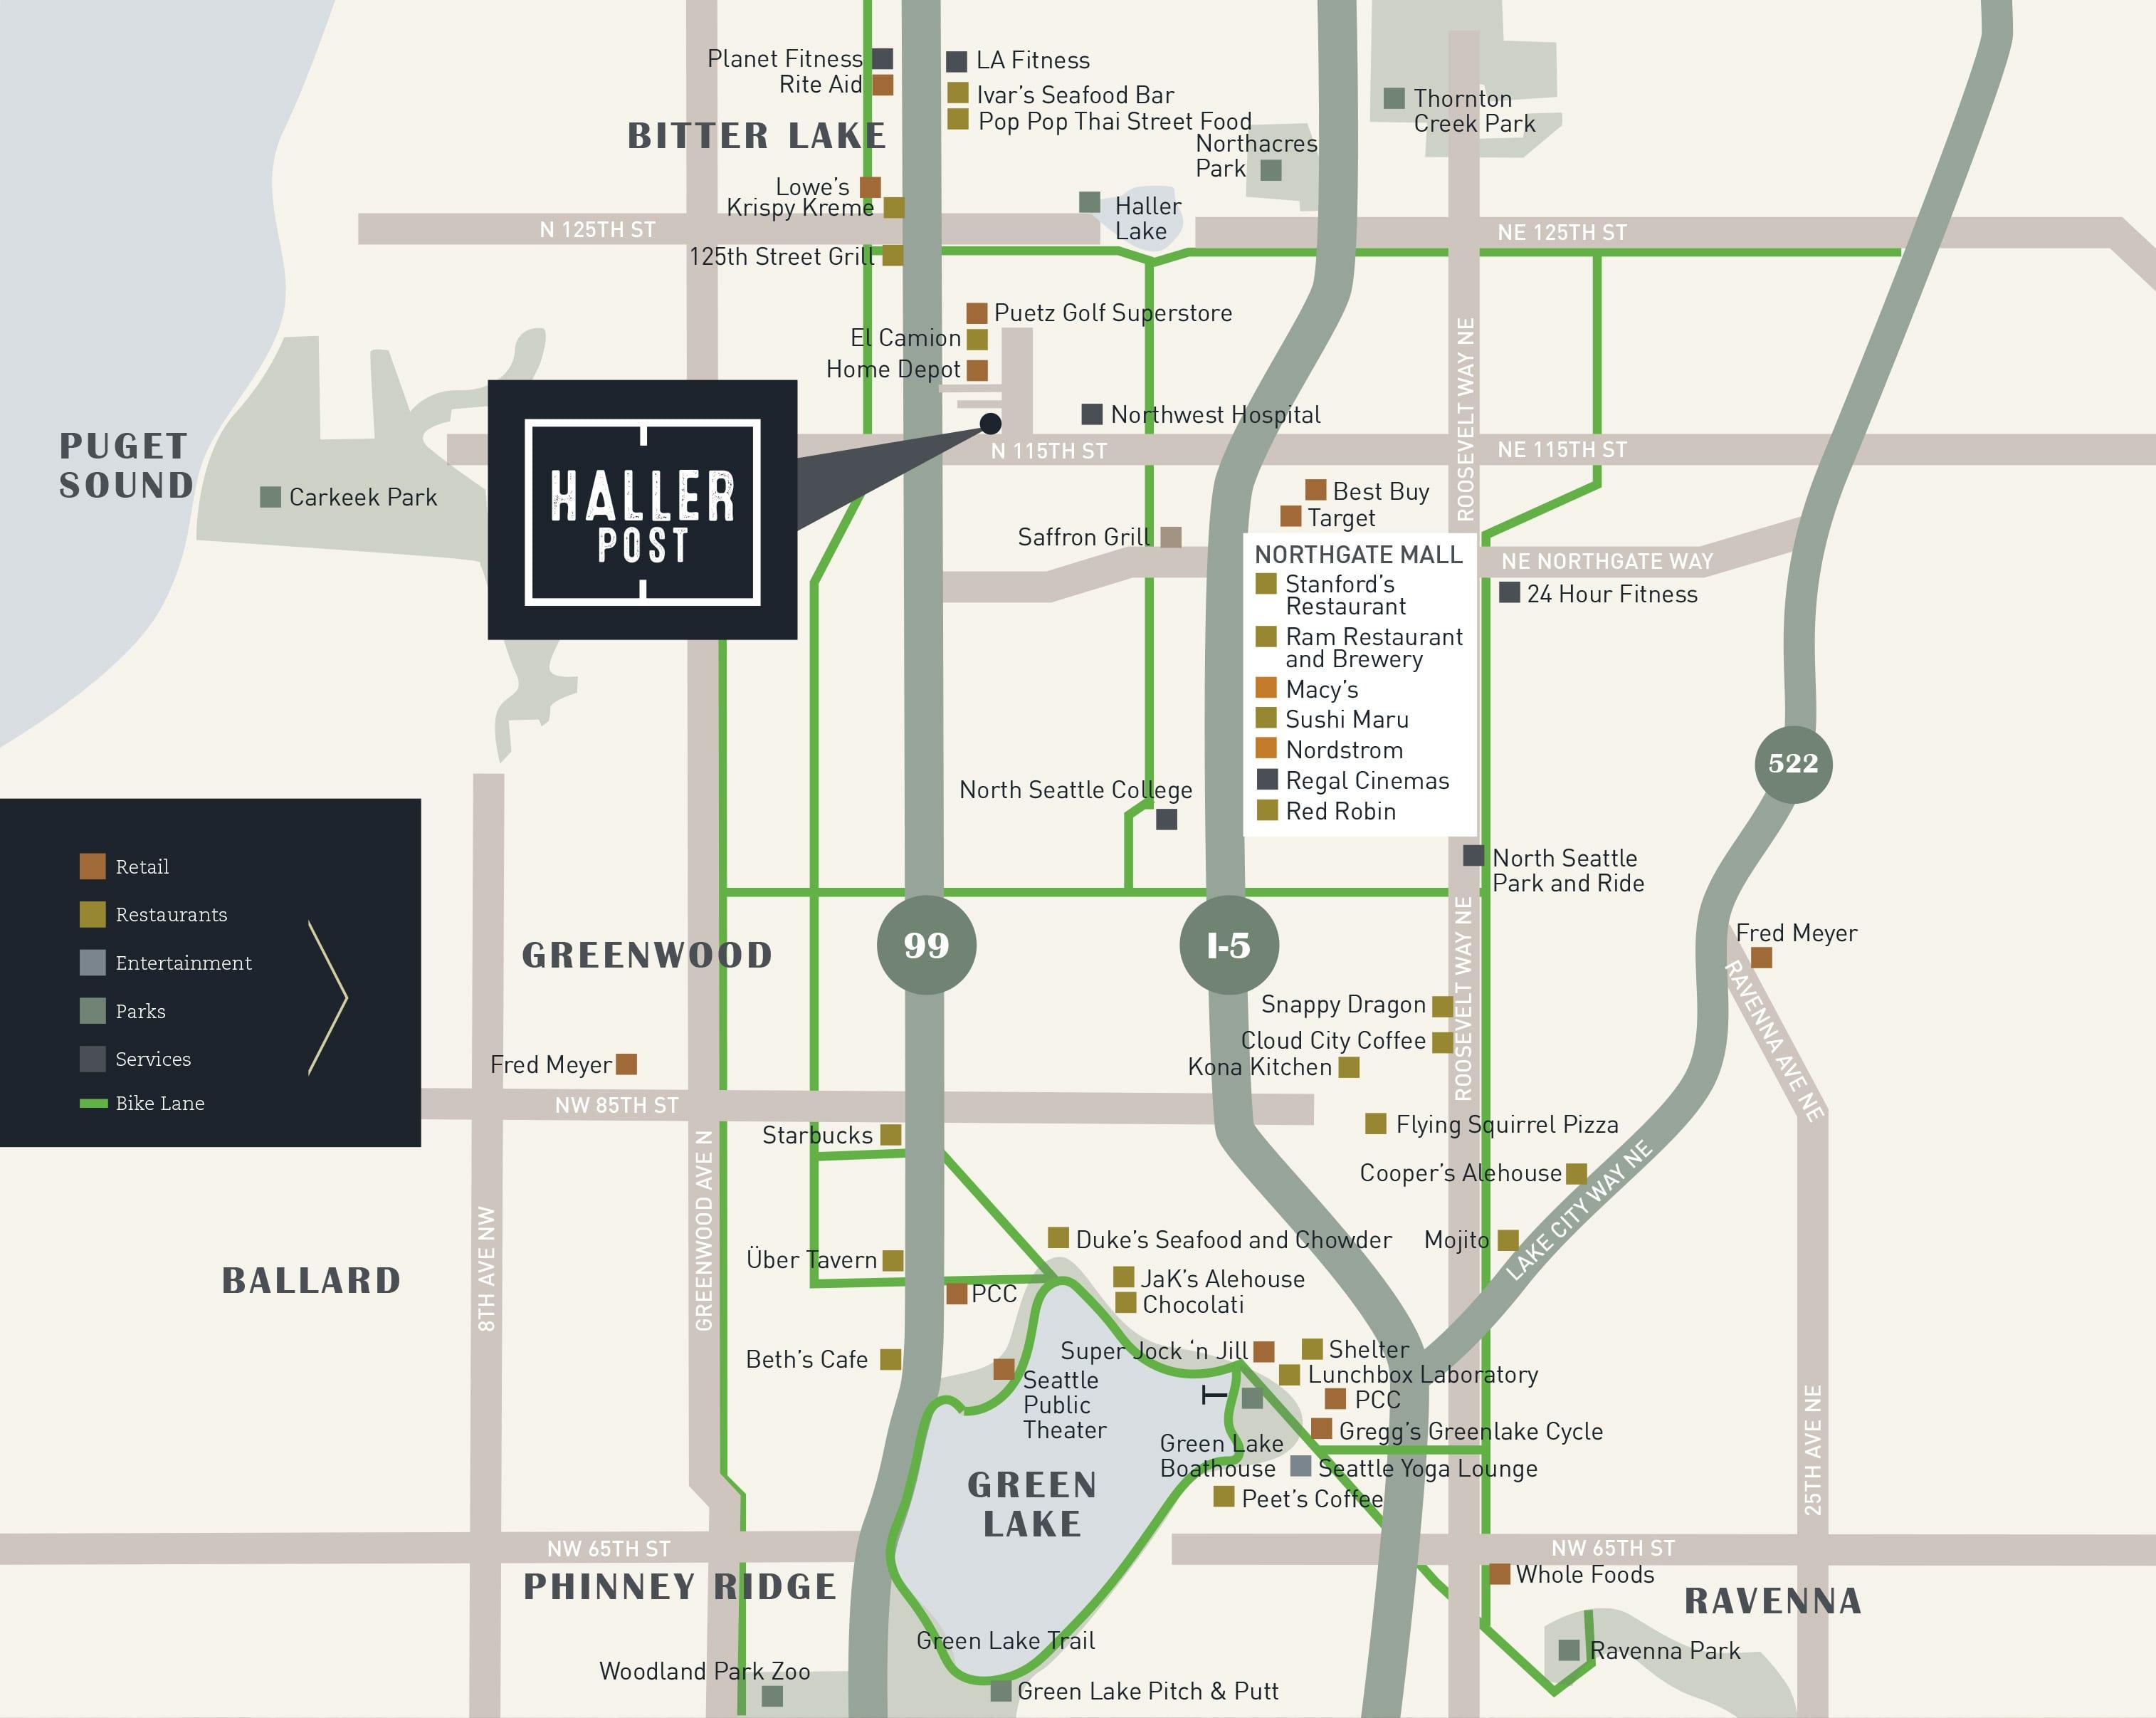 Haller Post map location.